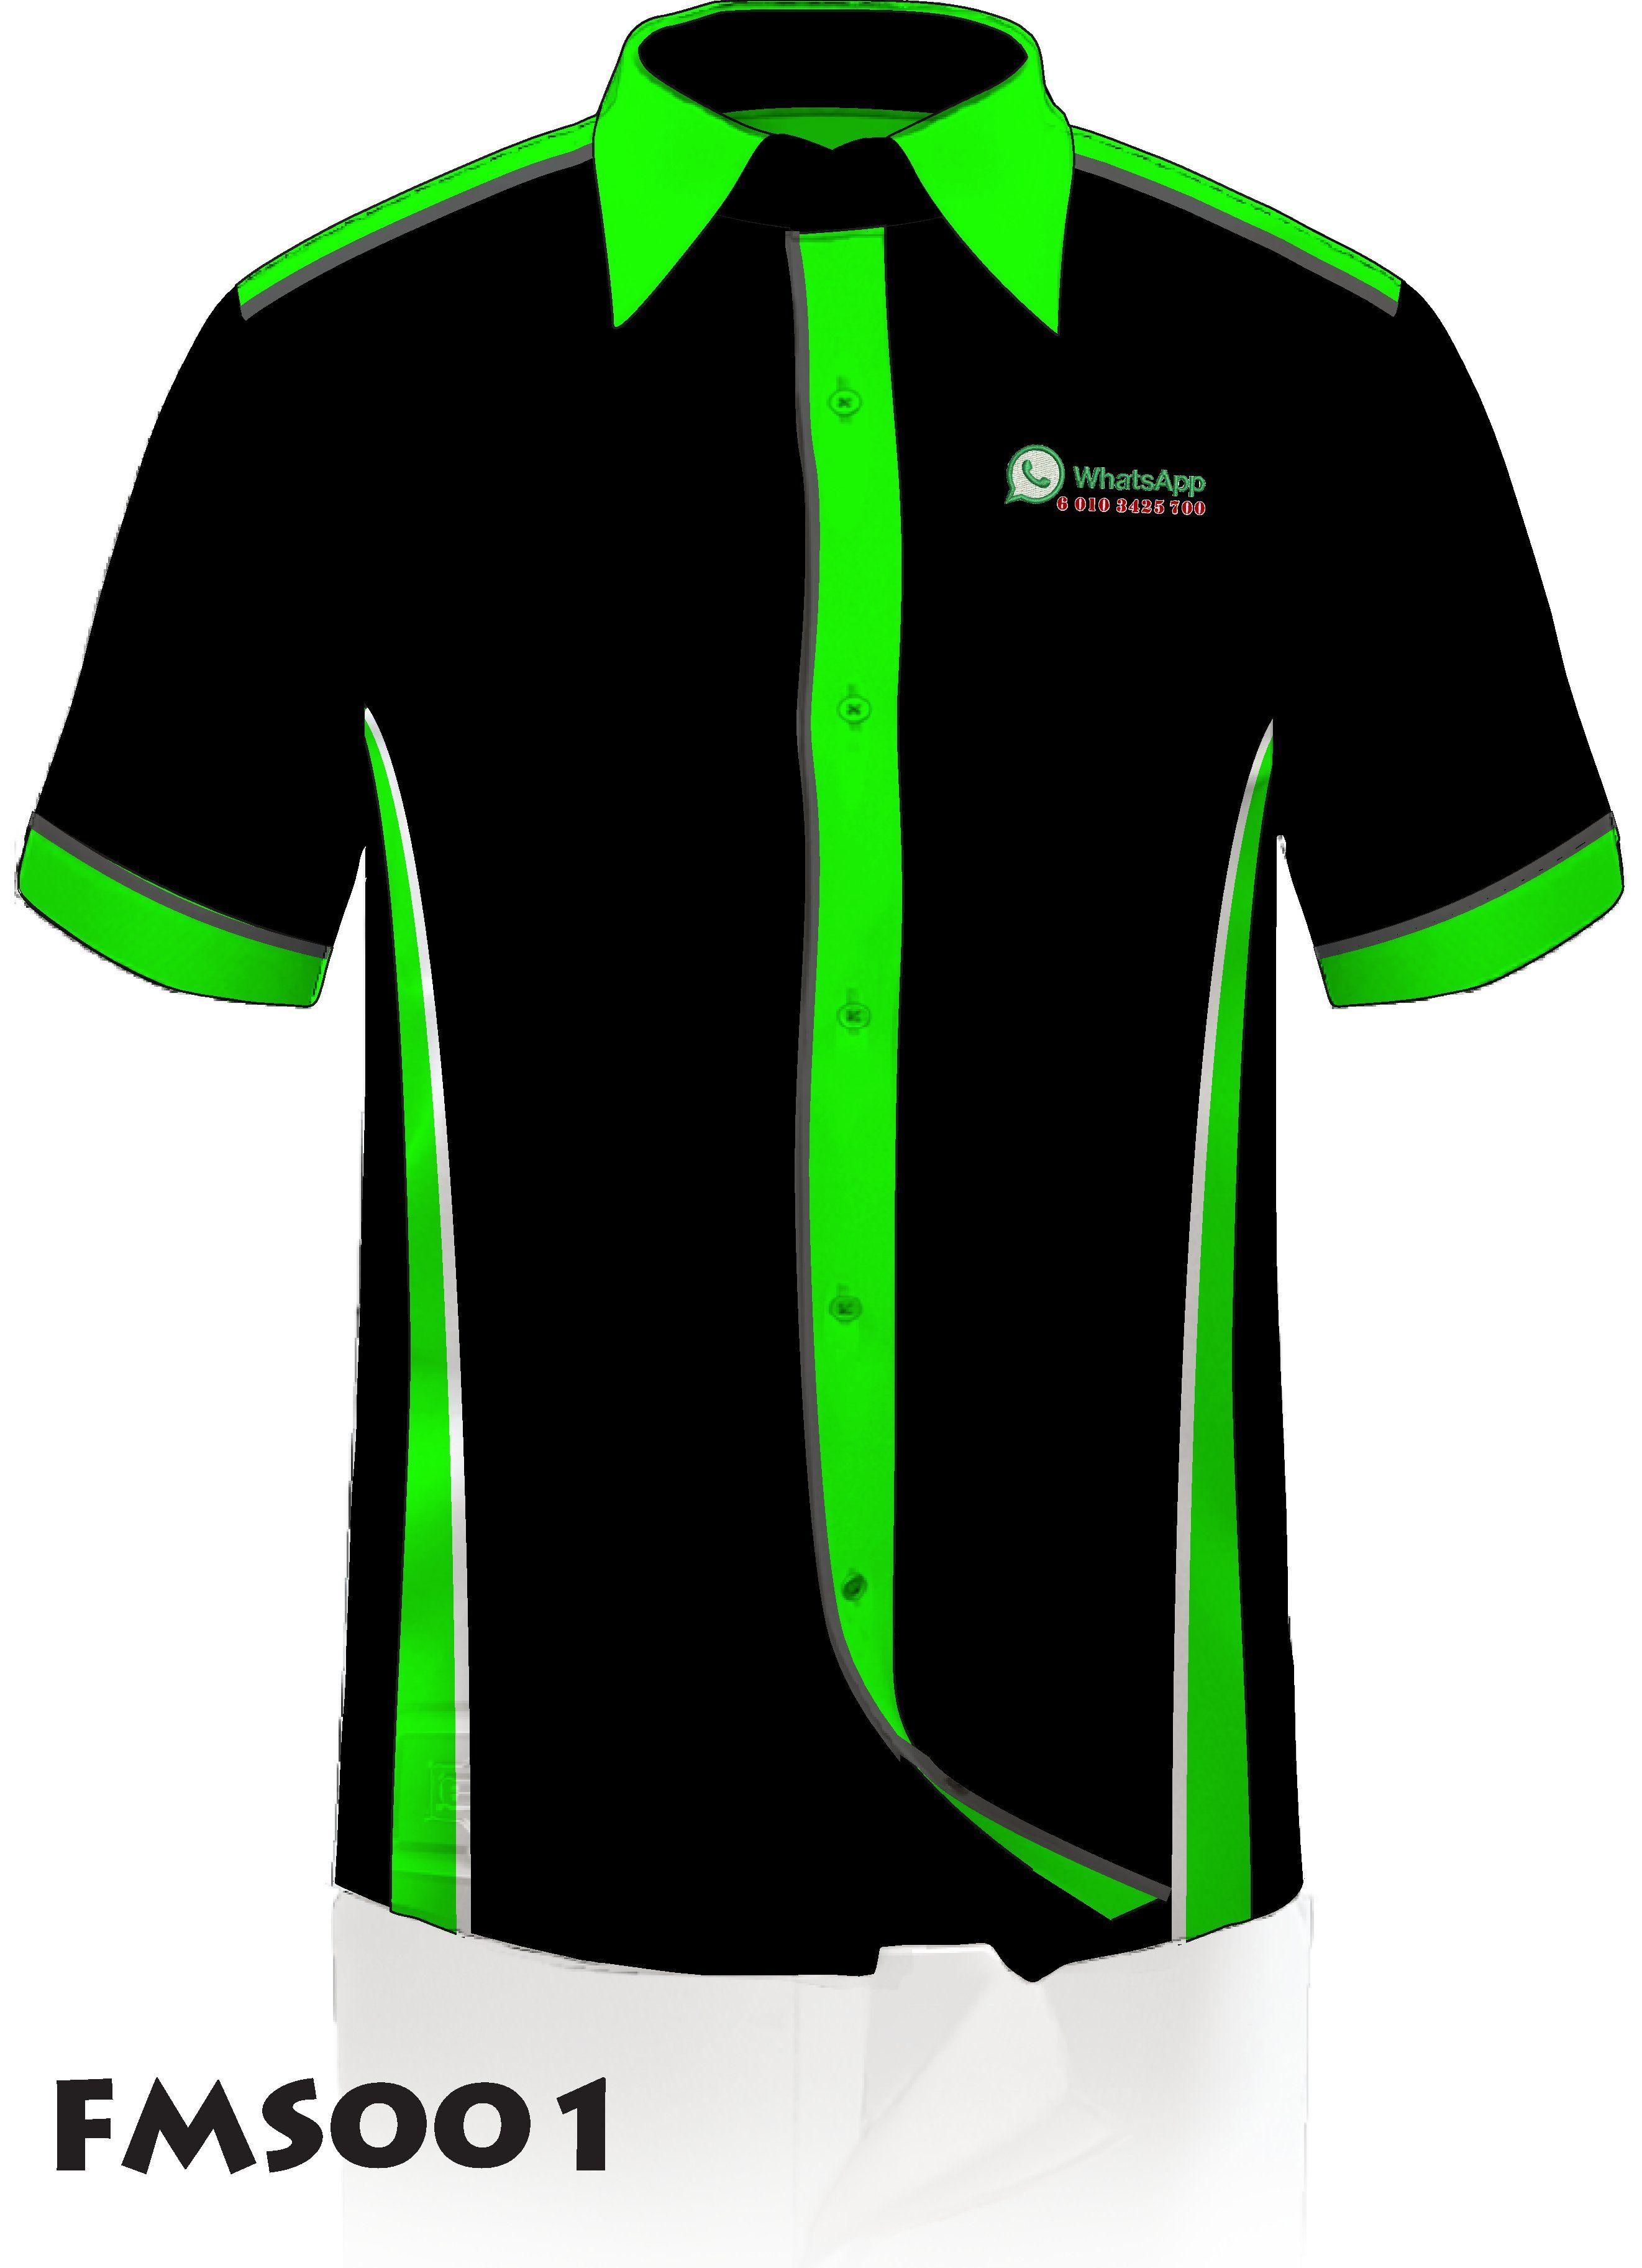 Contoh Baju Korporat Design 2018 Corporate shirts